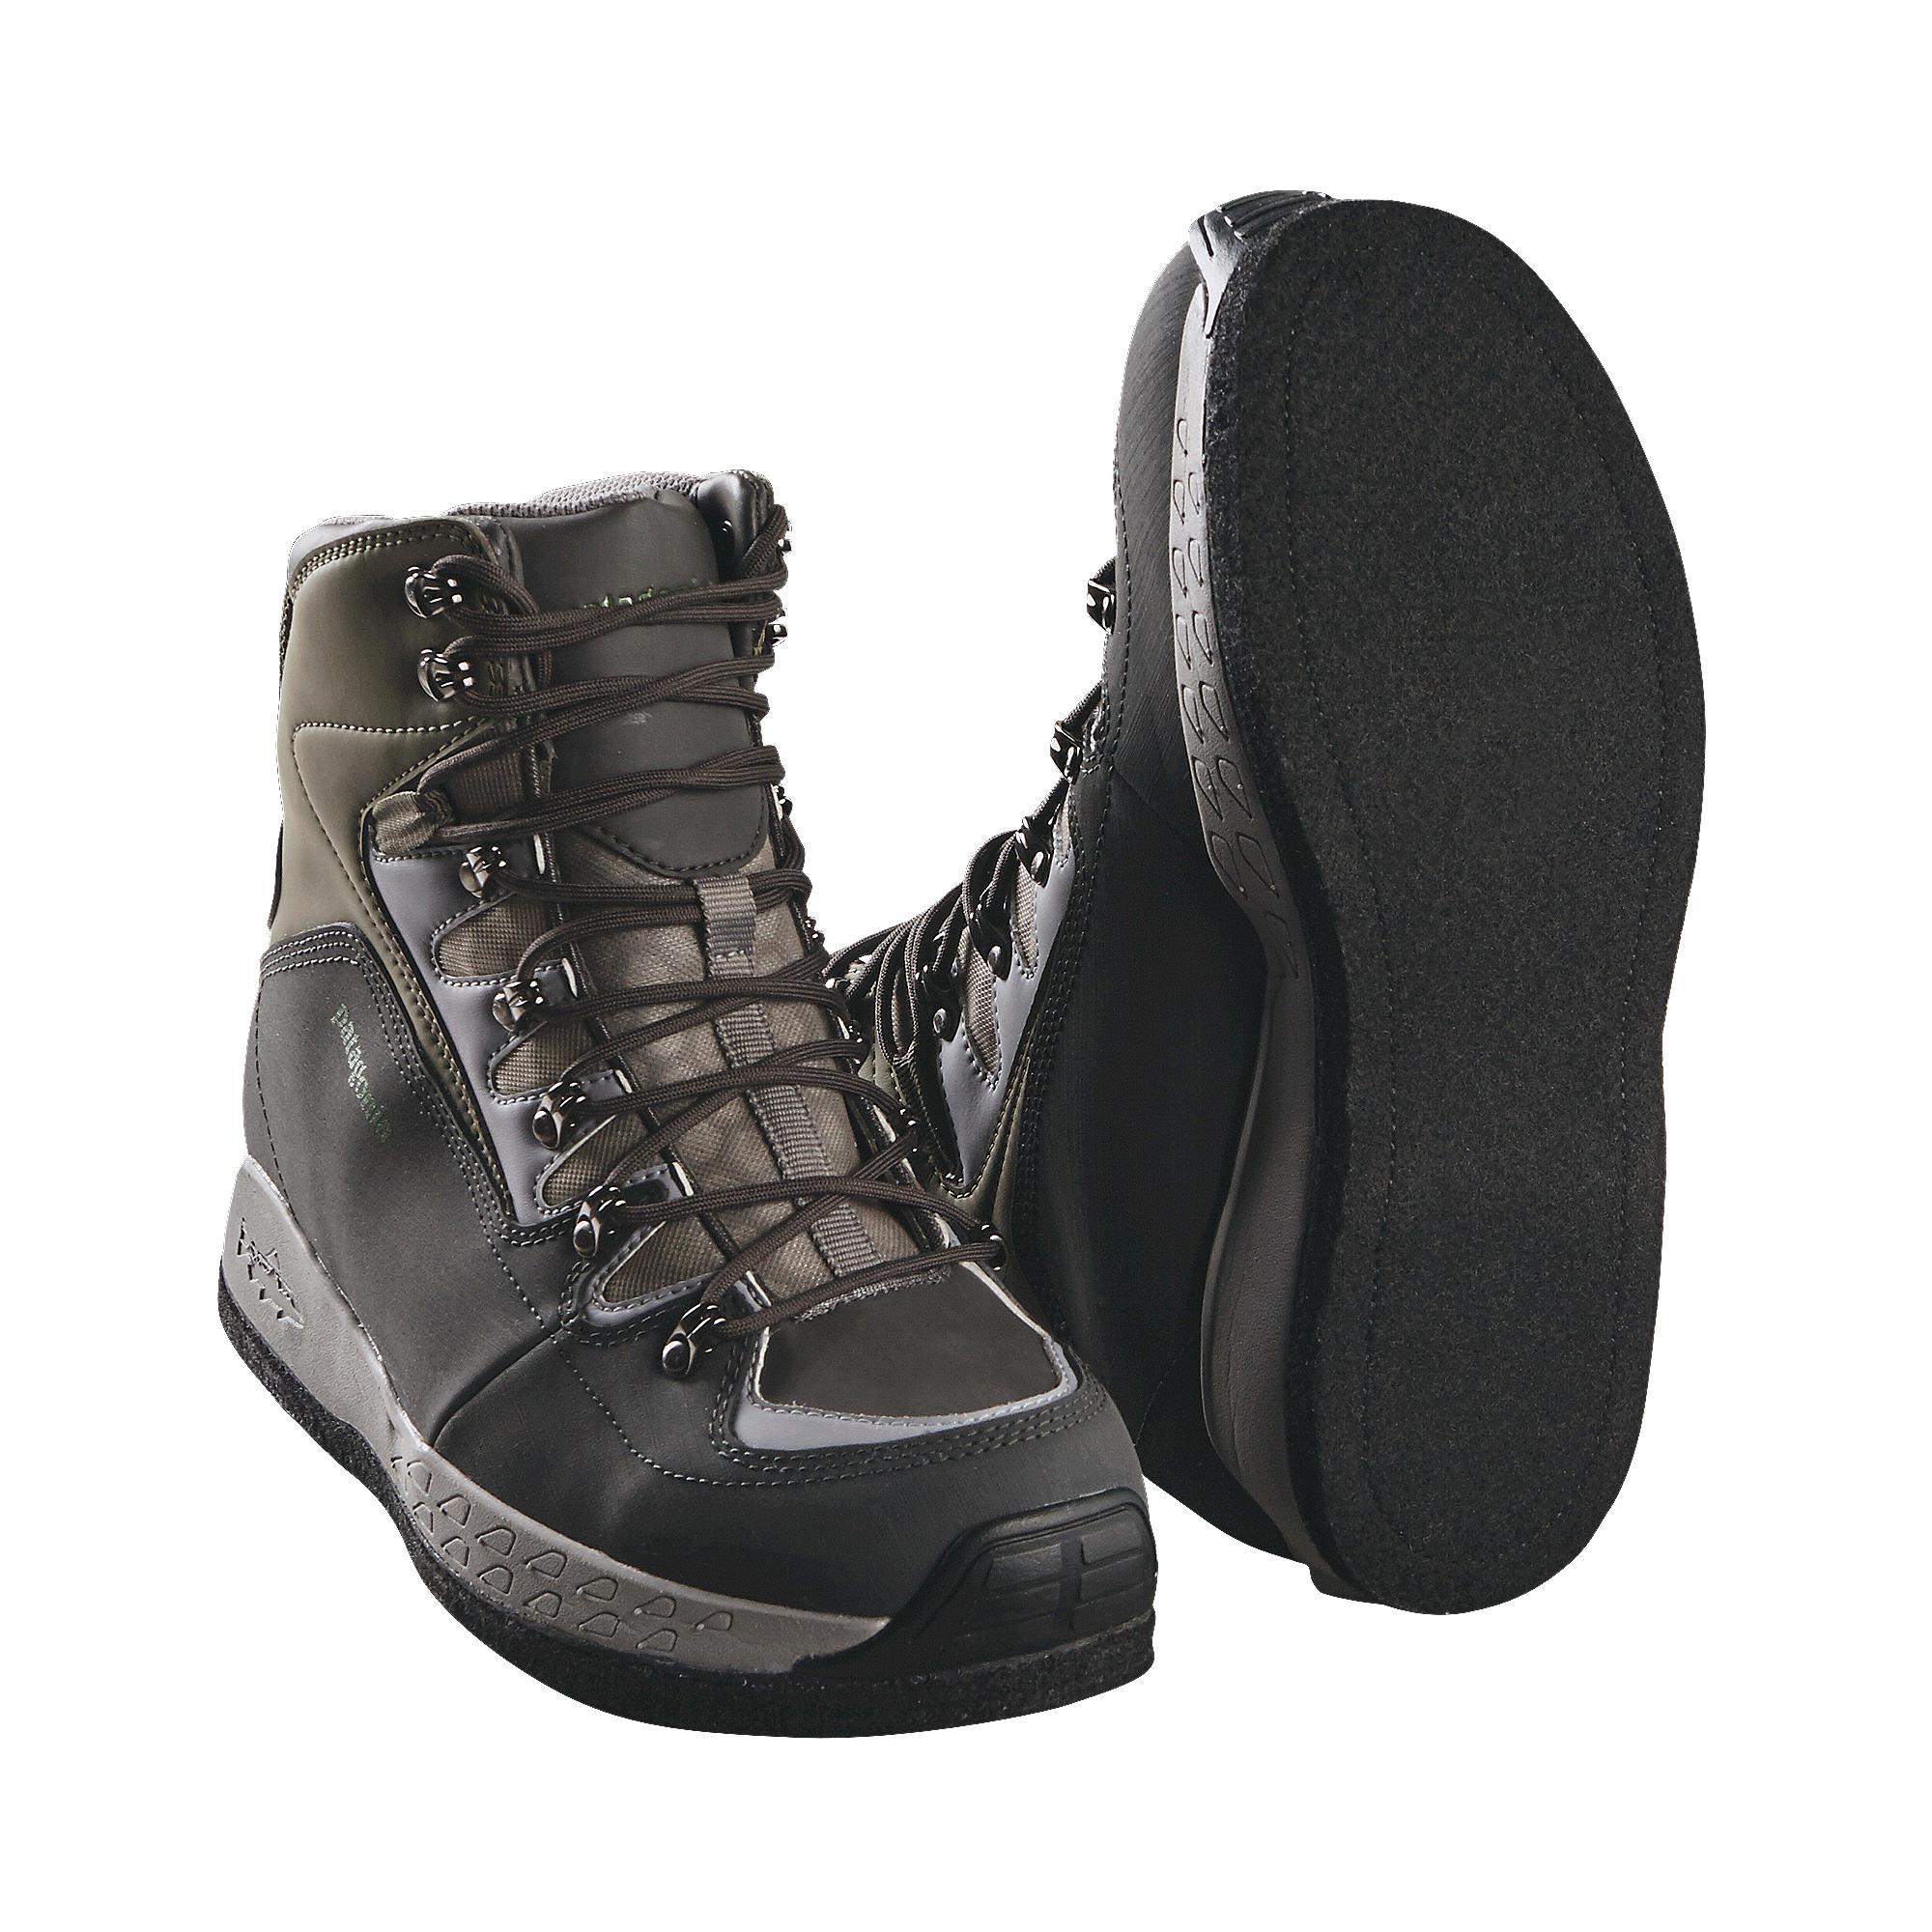 Patagonia Ultralight II Wading Boots US 11 // EUR 44 Sticky Watschuhe